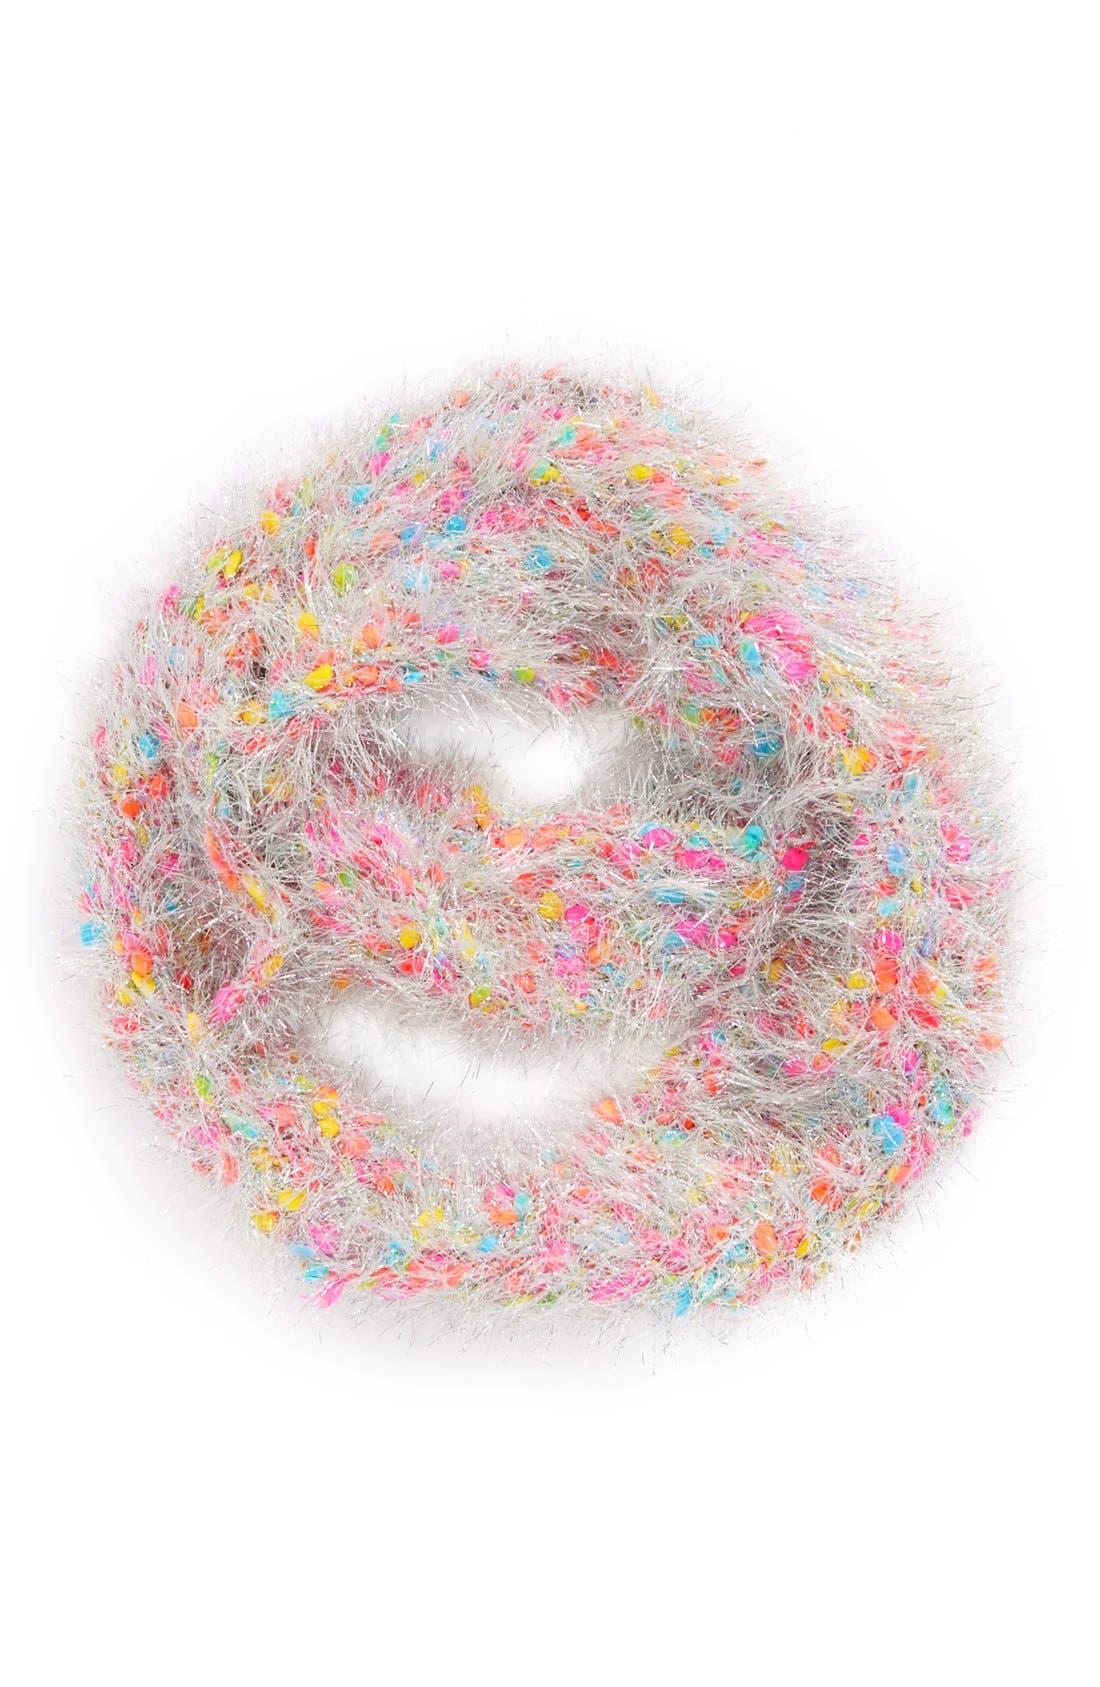 Main Image - Peace of Cake 'Sparkle Popcorn' Infinity Scarf (Girls)